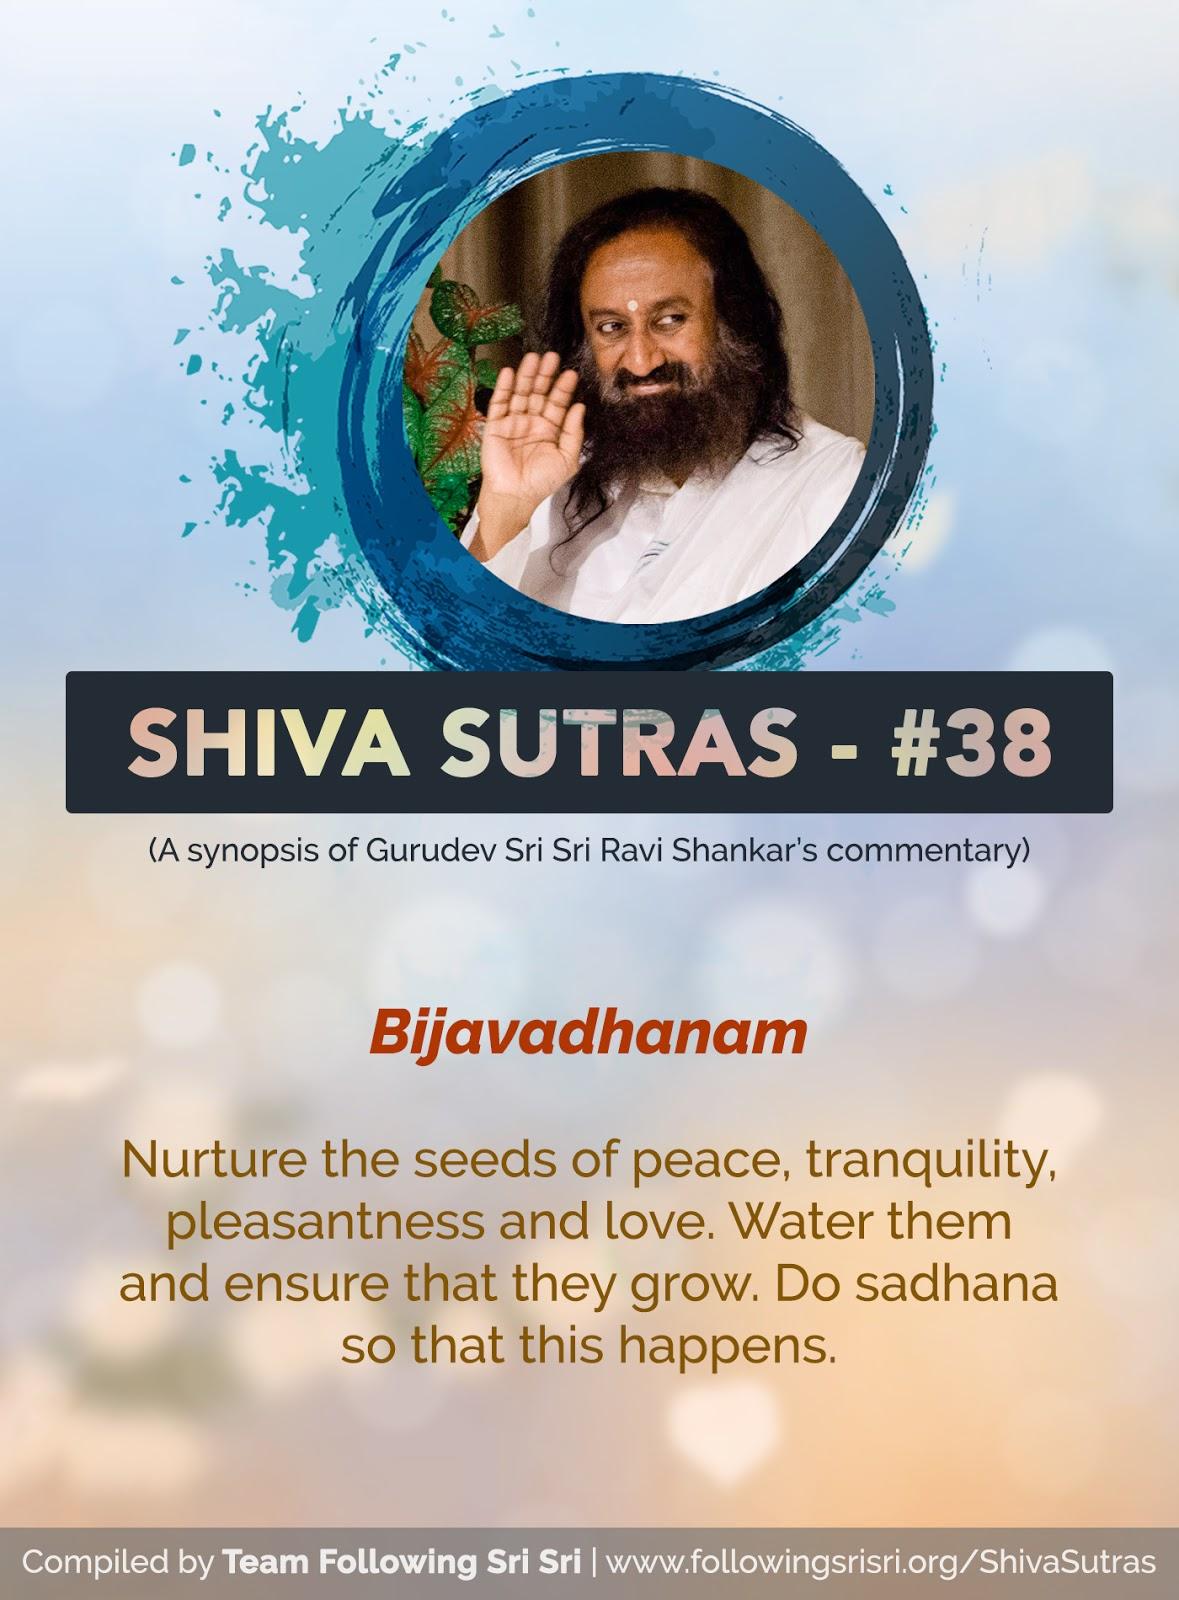 Shiva Sutras - Sutra 38